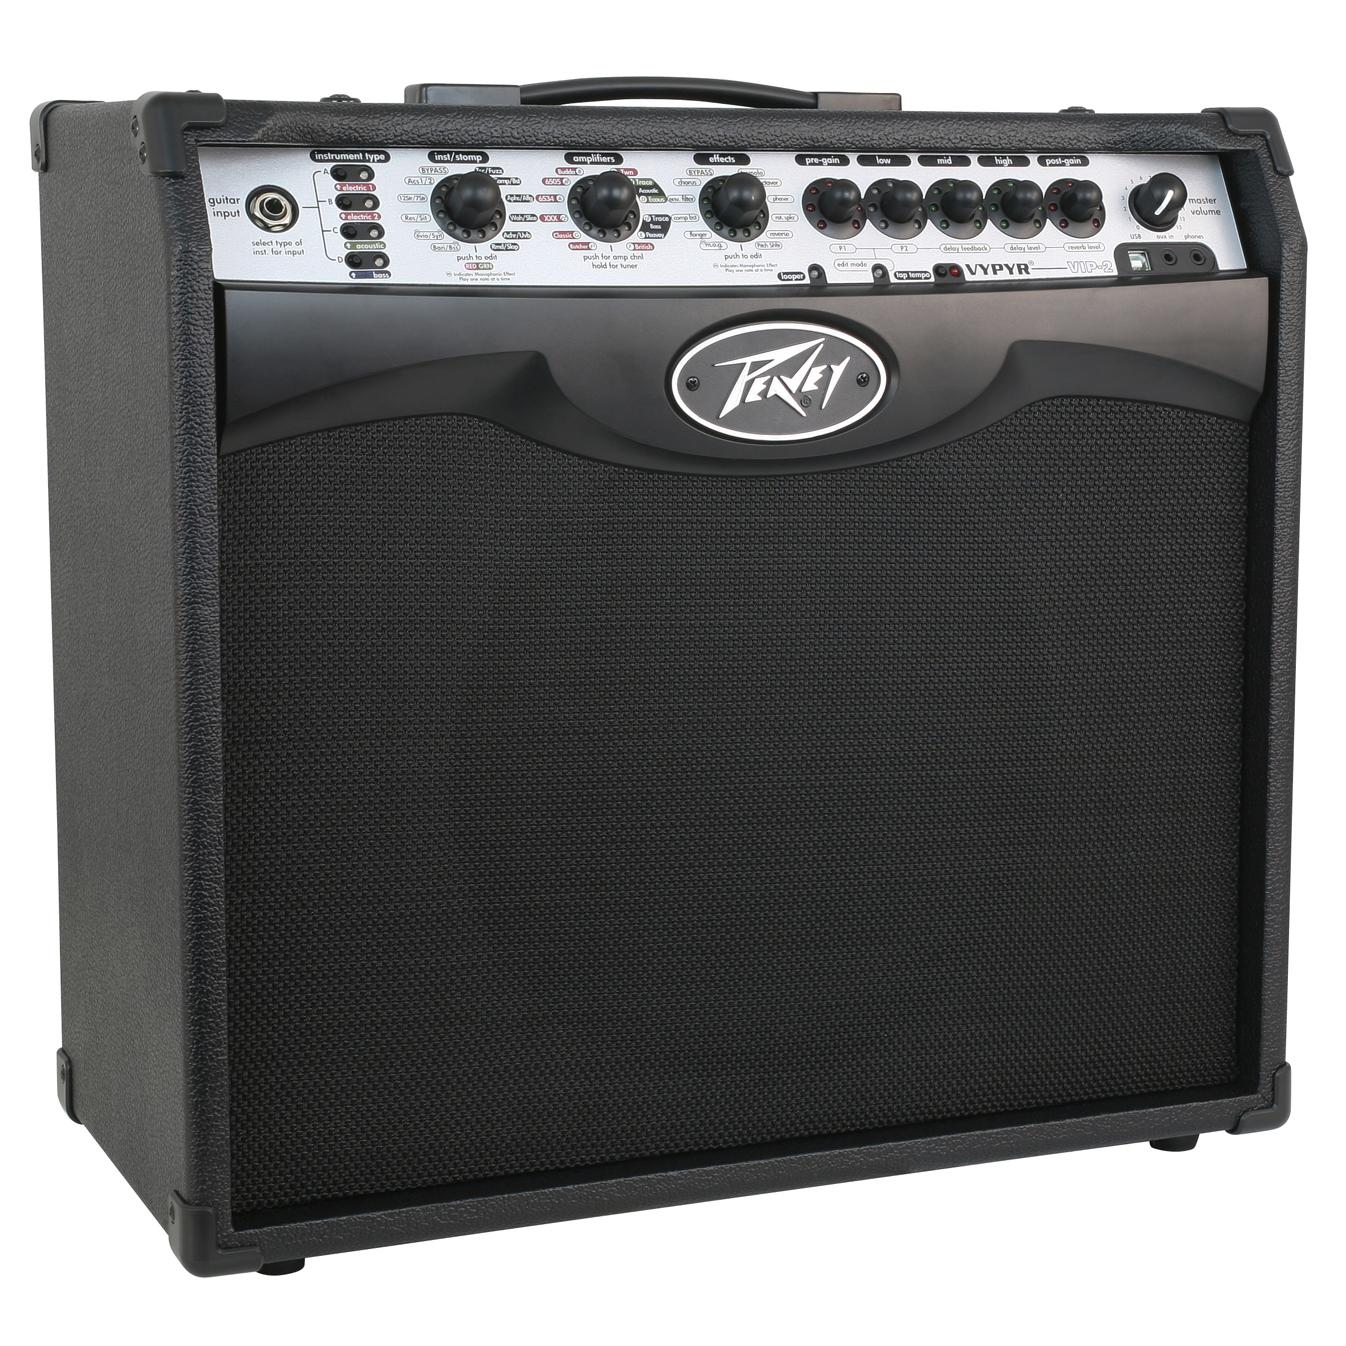 peavey vypyr vip 2 modeling instrument guitar bass 40 watt 12 amplifier amp ebay. Black Bedroom Furniture Sets. Home Design Ideas